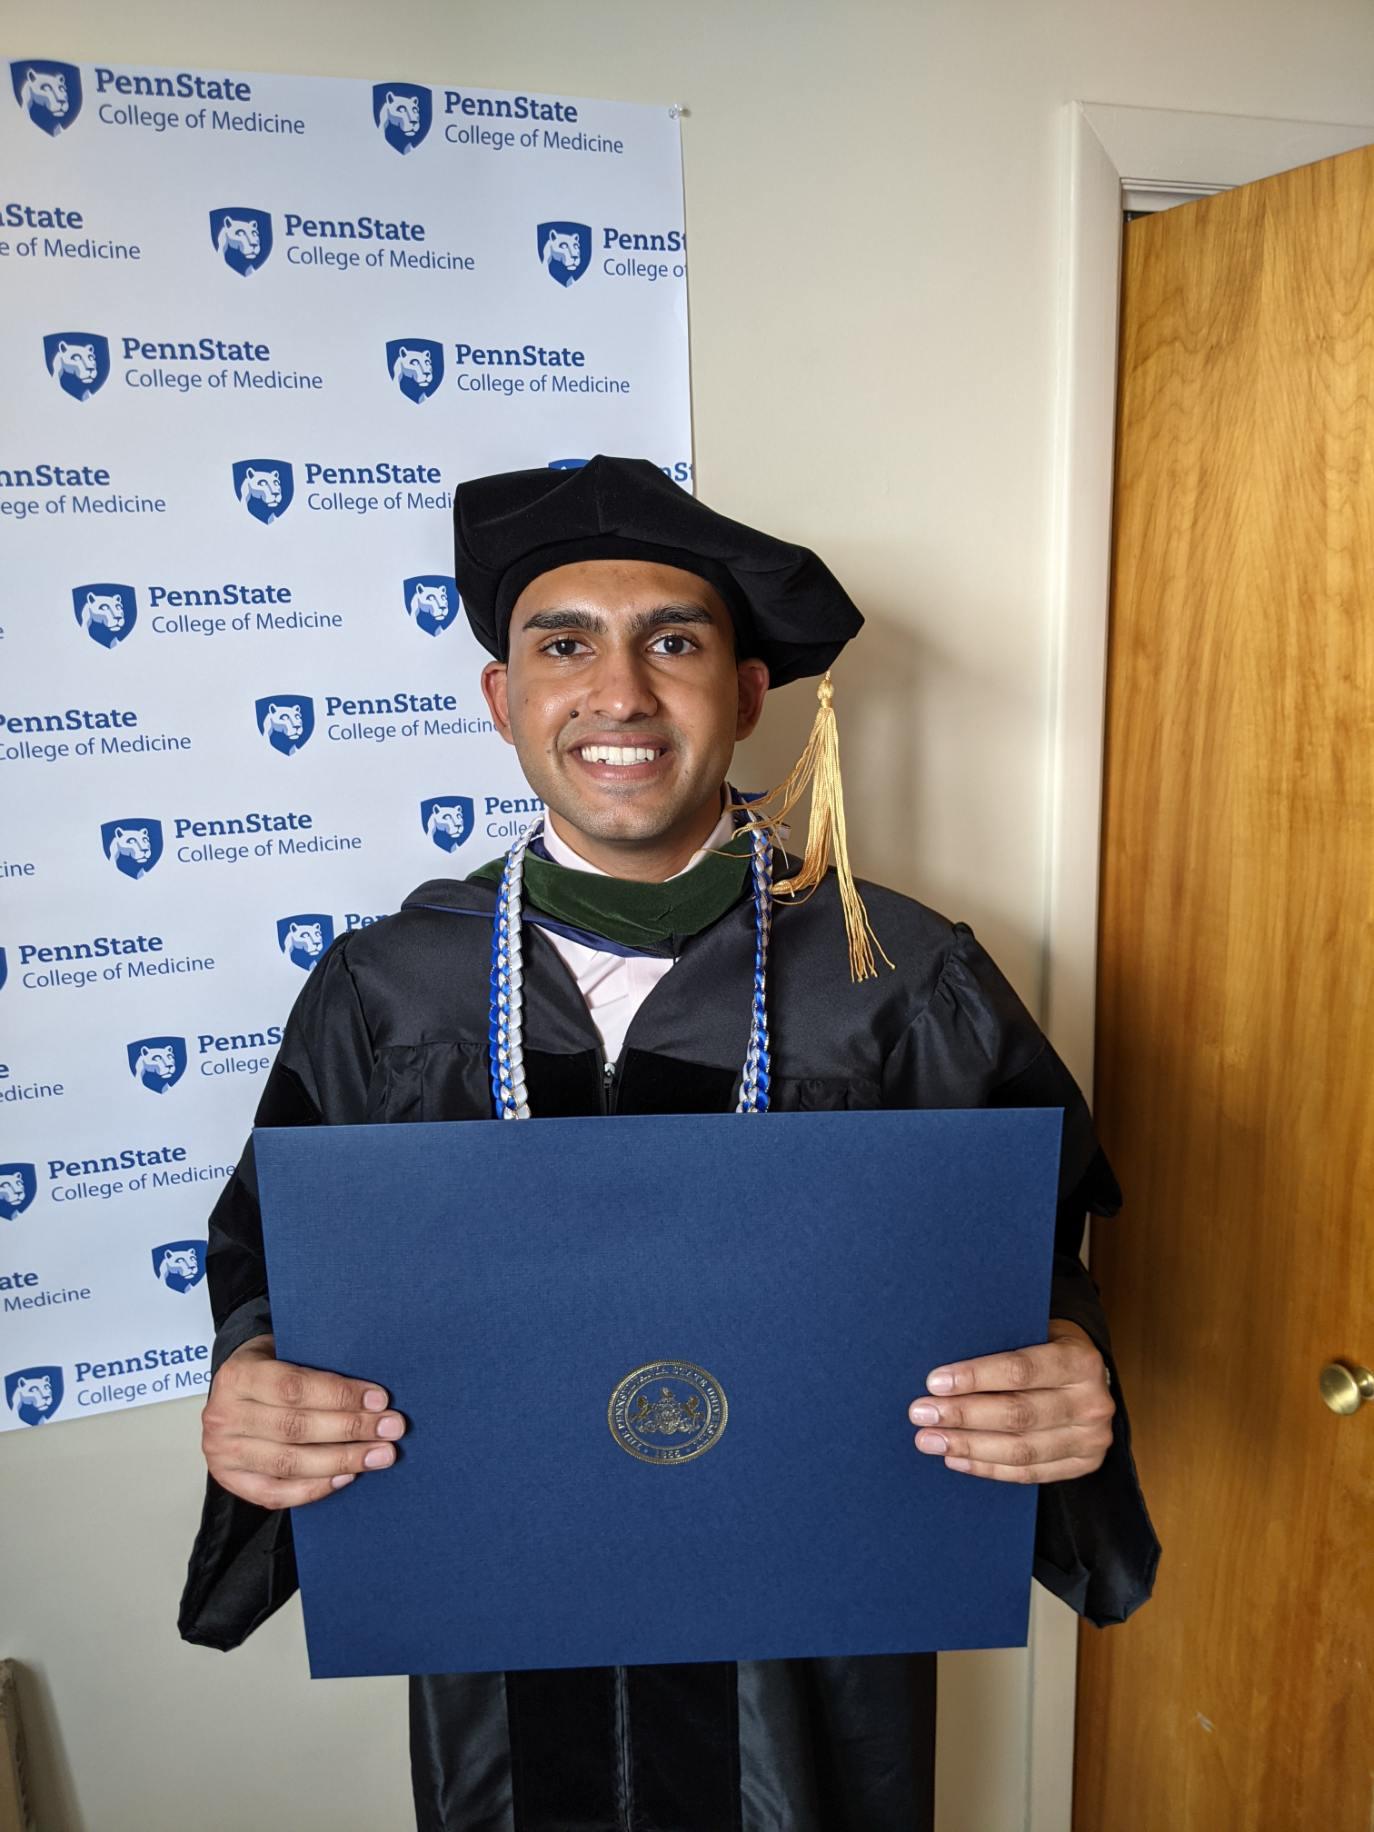 A man in graduation regalia holds a diploma.